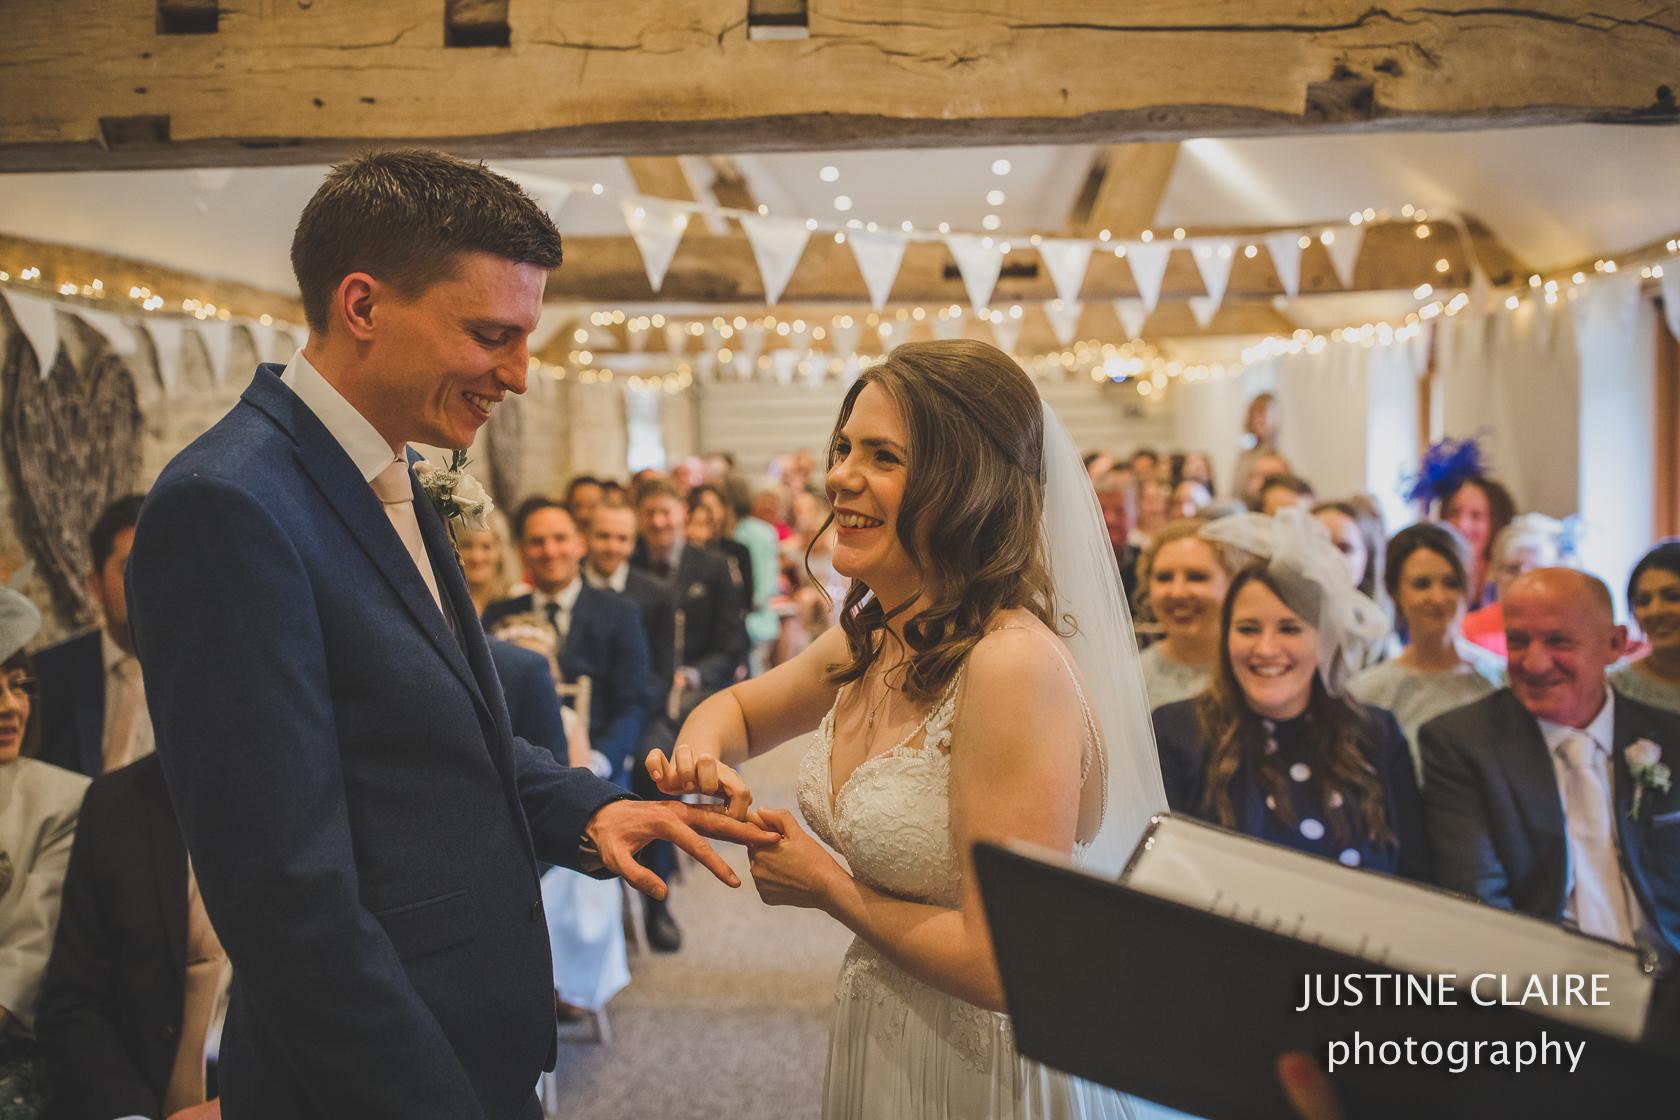 Fitzleroi Fittleworth petworth Billingshurst farm Wedding Photography by Justine Claire photographer Arundel Worthing Brighton-21.jpg